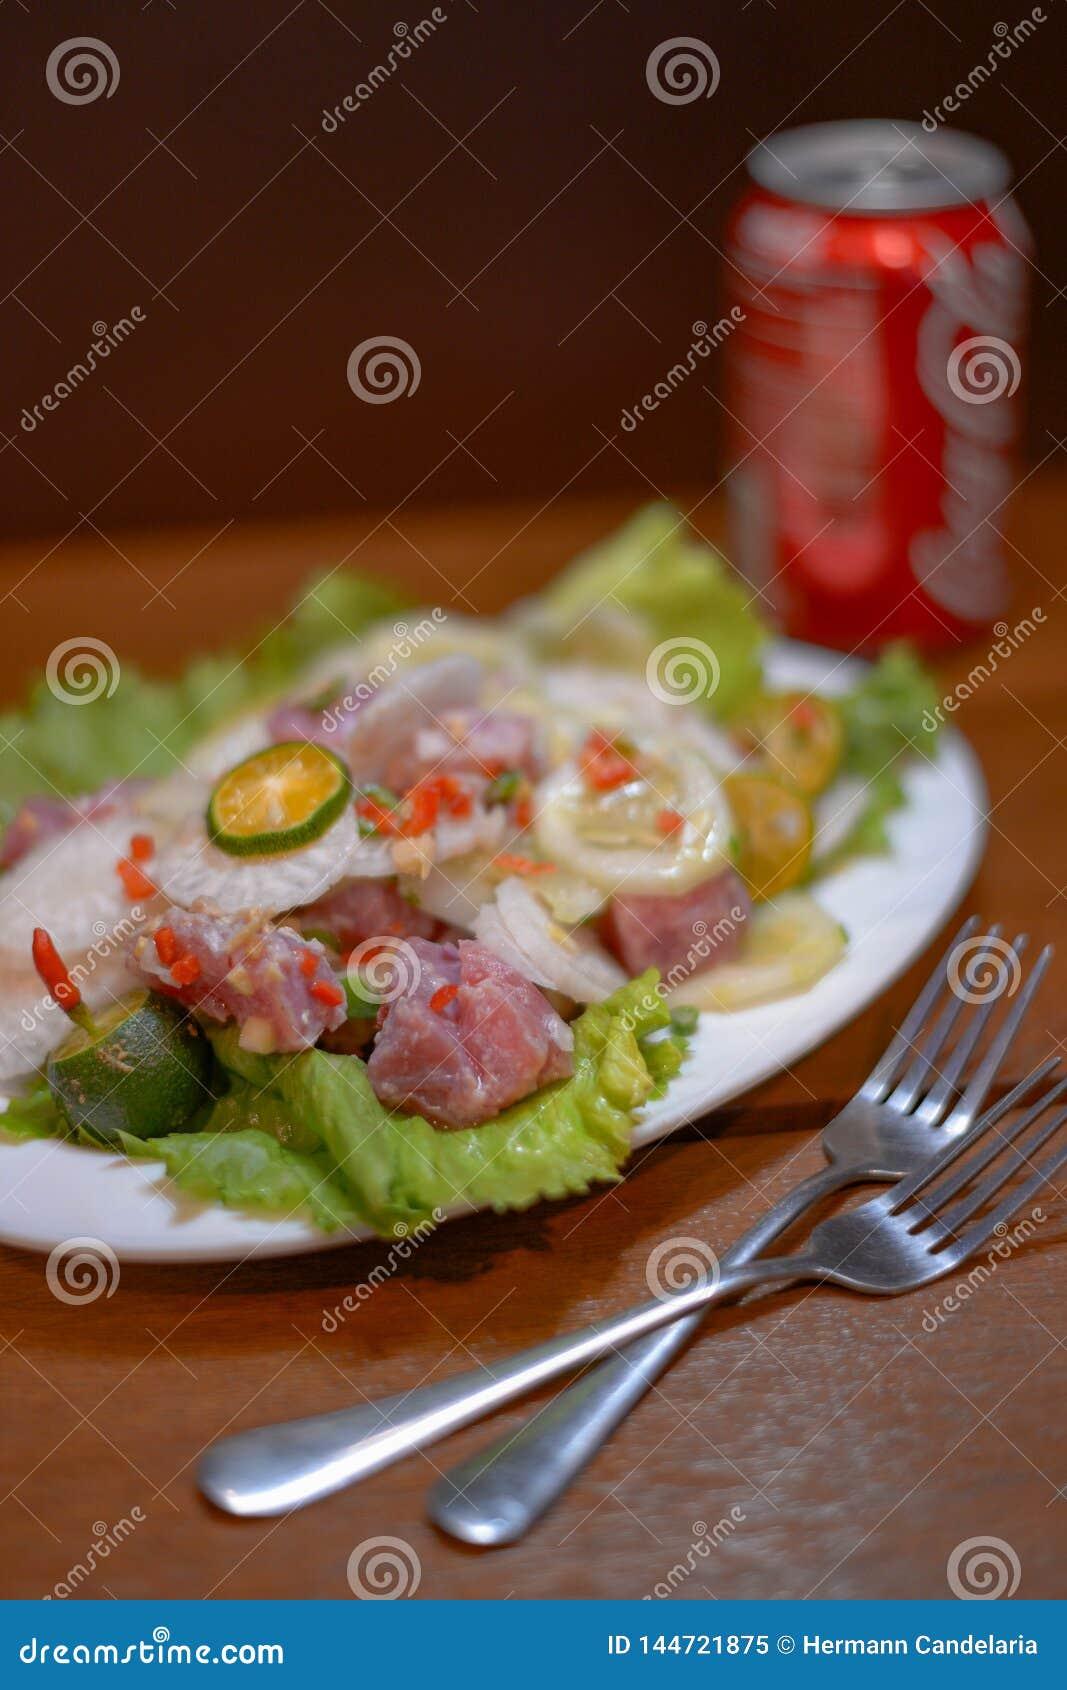 Kinilaw raw fish seafood dish native to the Philippines Filipino ceviche